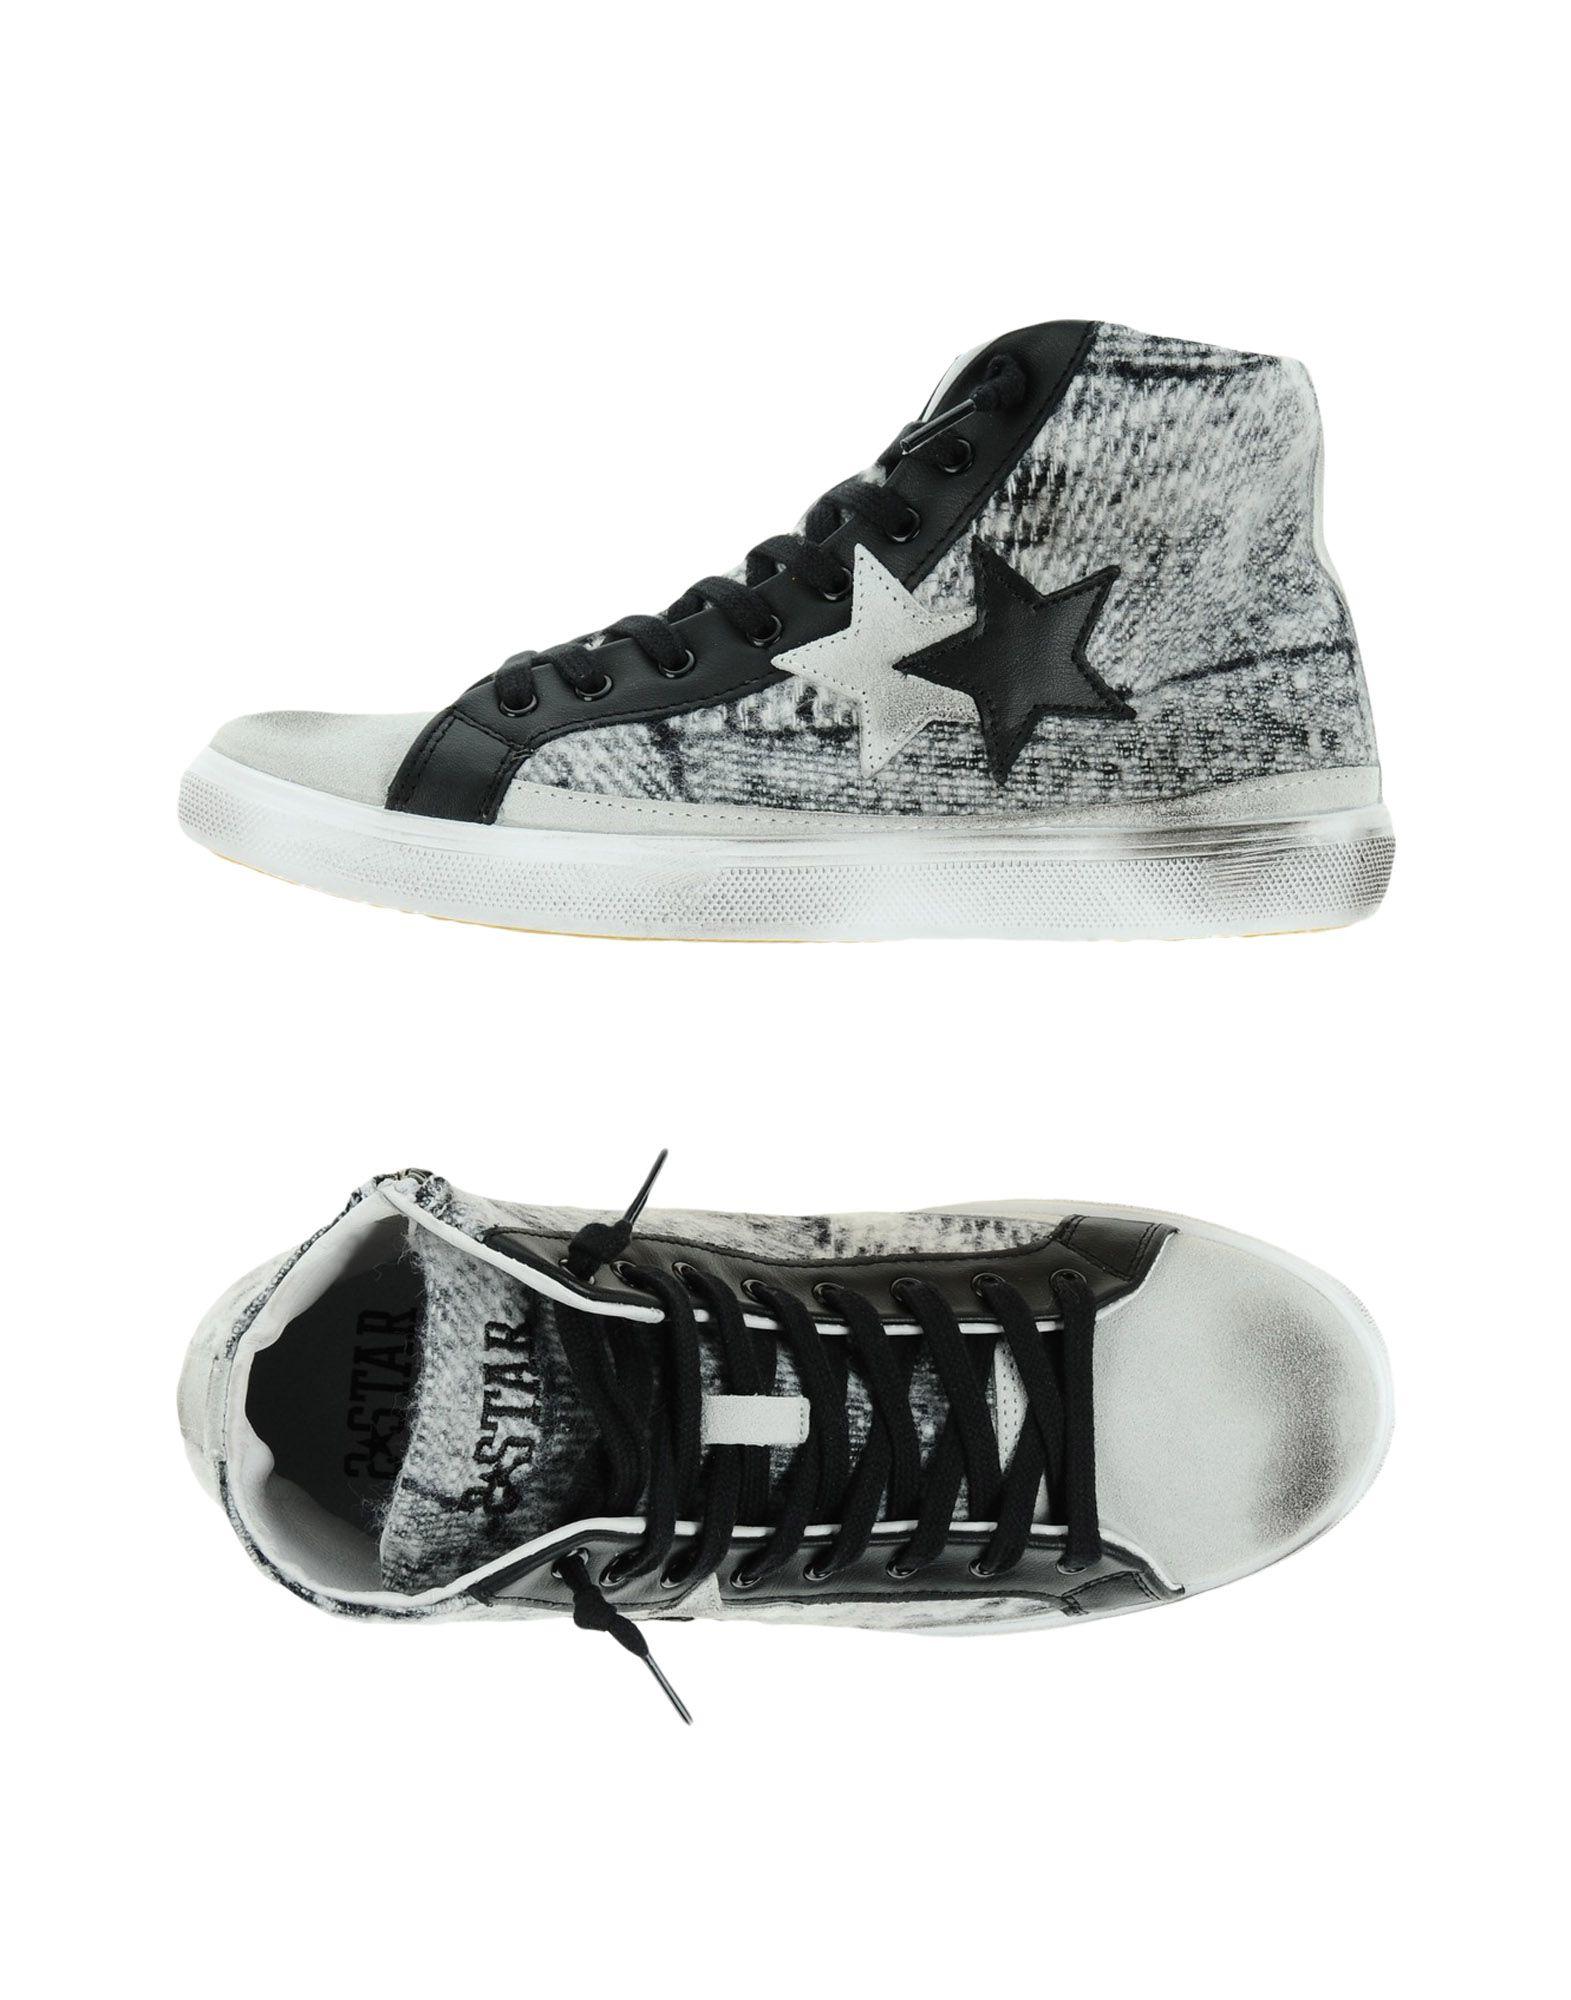 11336727RP 2Star Sneakers Herren  11336727RP  Heiße Schuhe c42e33